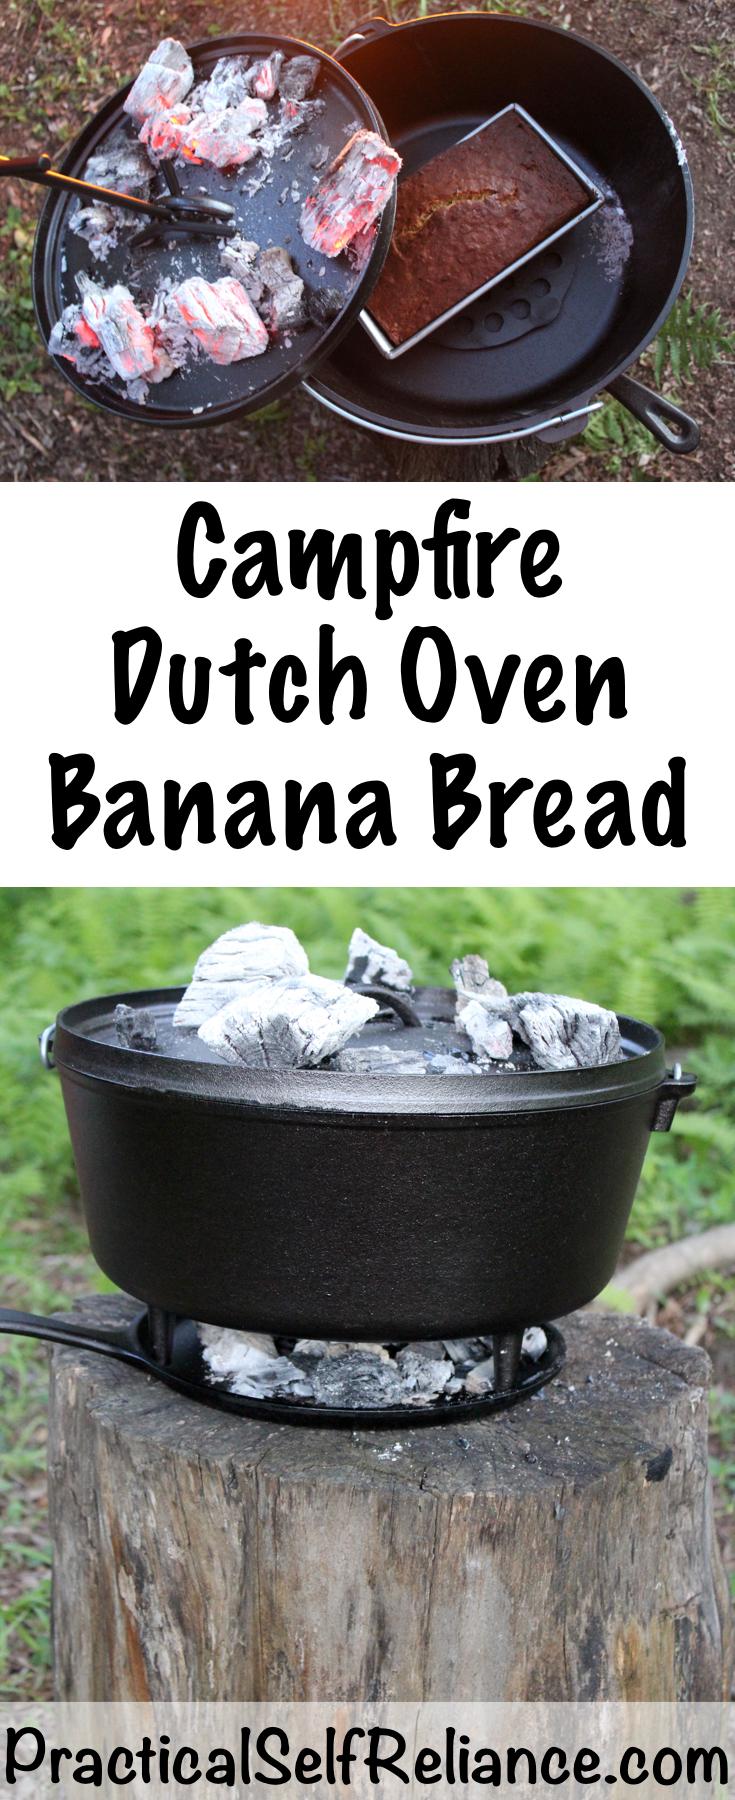 Campfire Dutch Oven Banana Bread